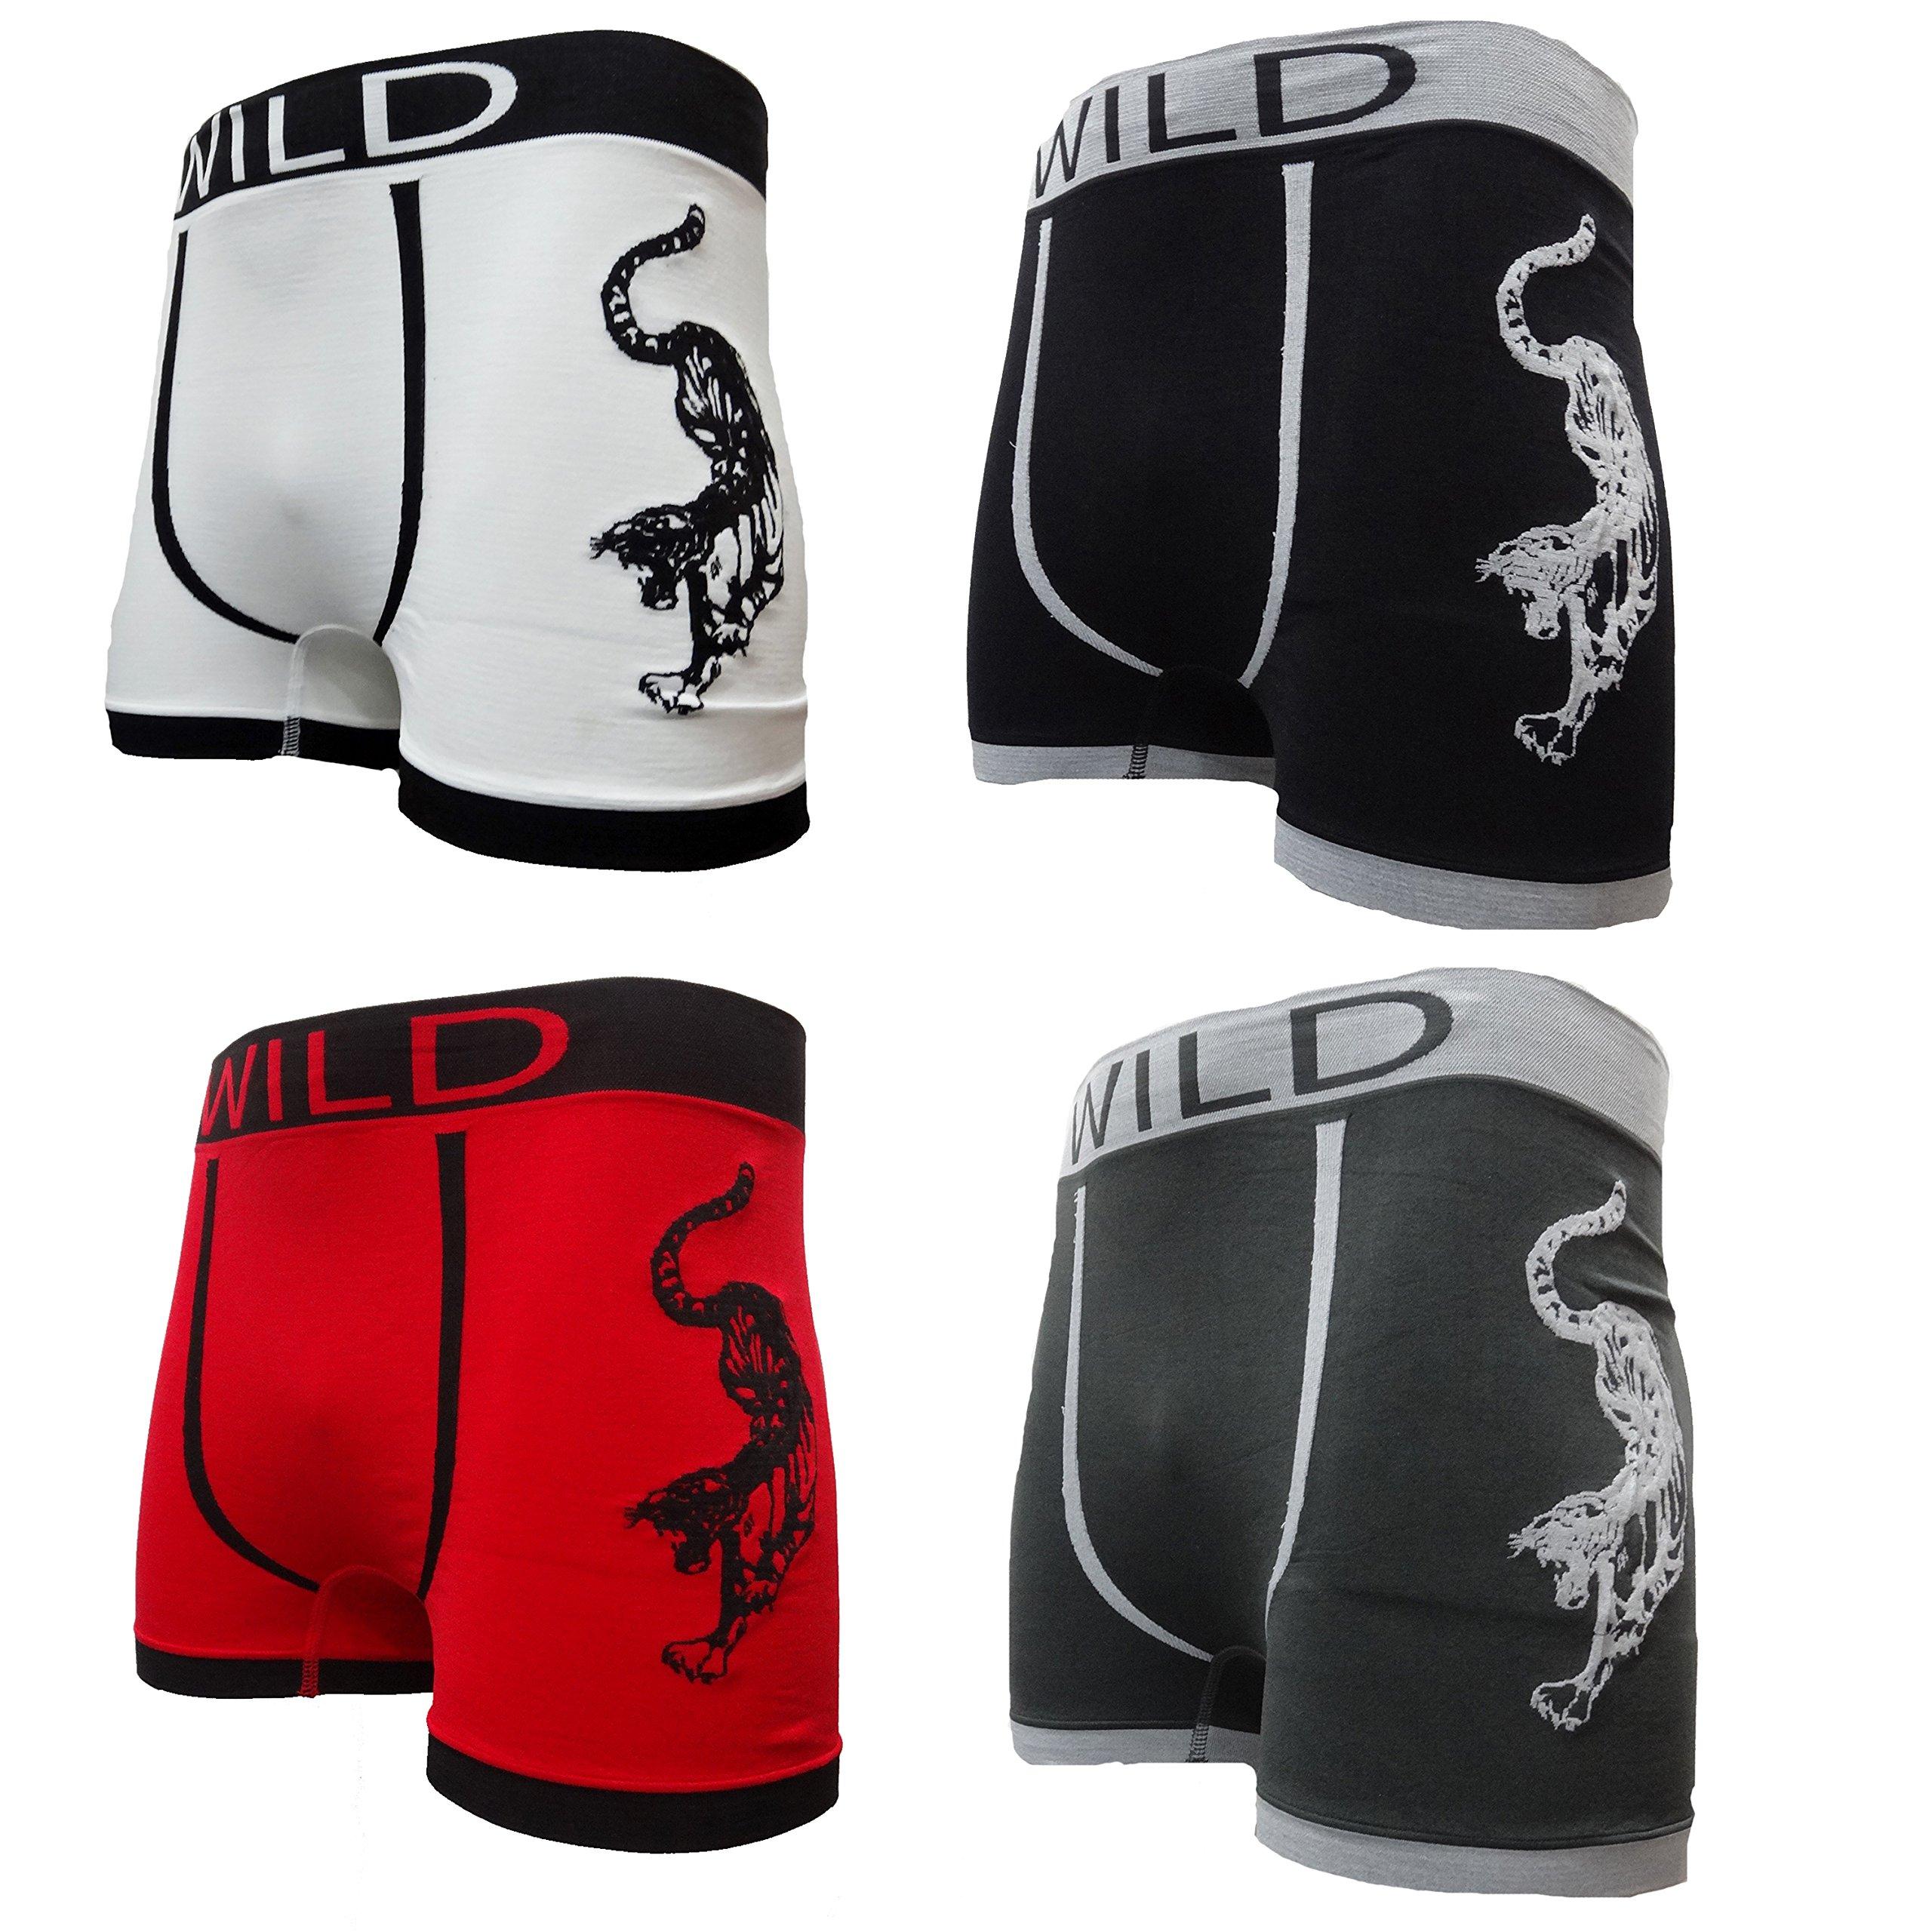 3 Pairs Adults Mens Cotton Boxer Shorts Striped Trunks Briefs Designer Underwear